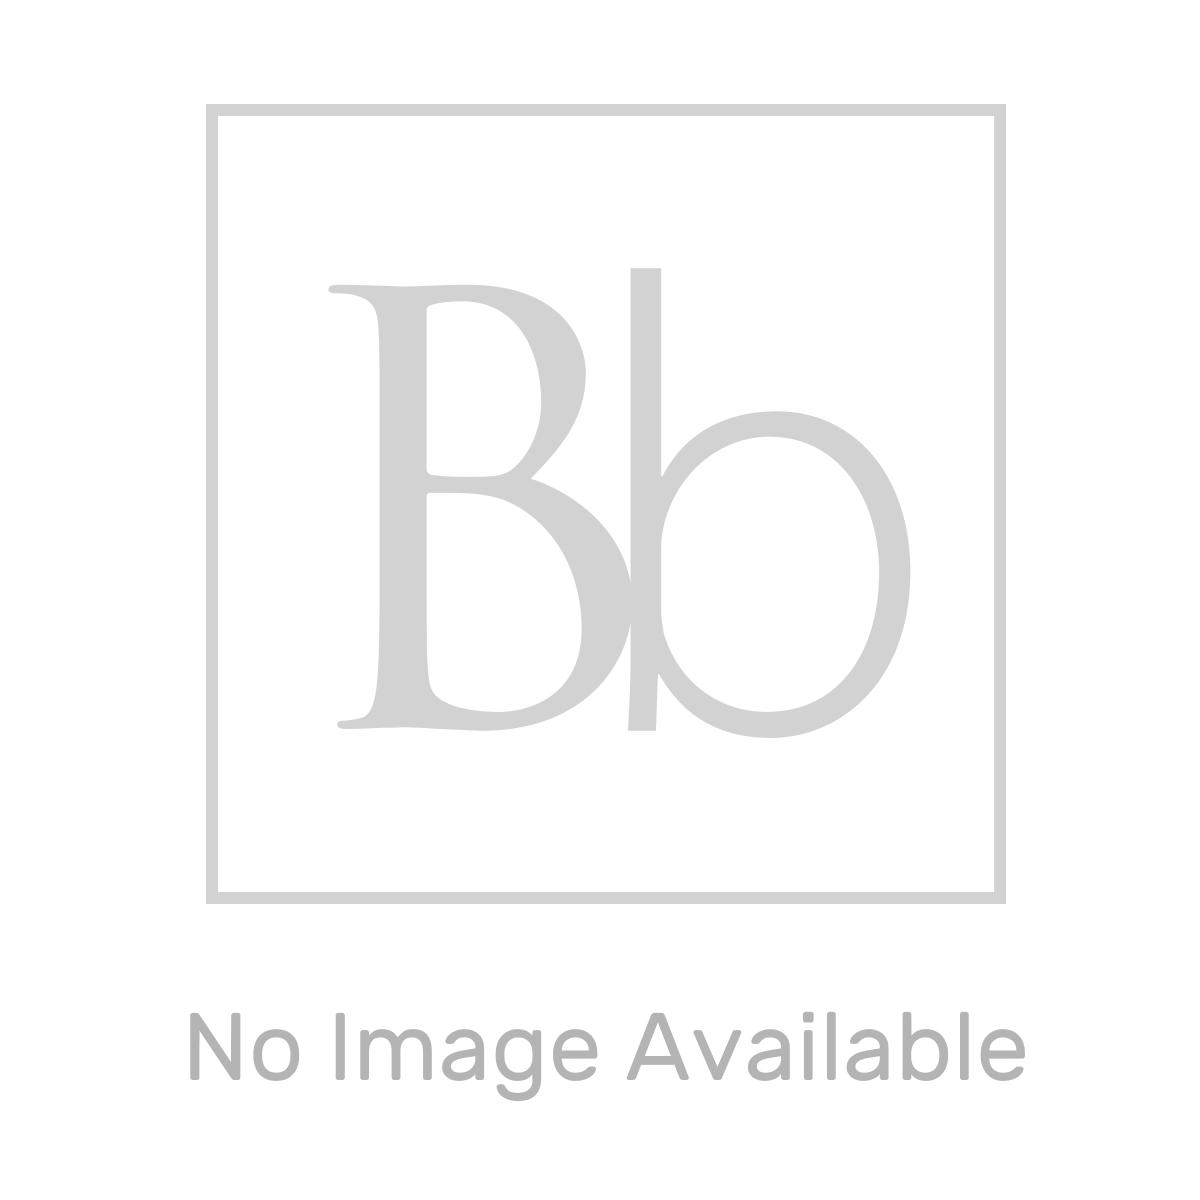 Sensio Ainsley Single Door LED Cabinet Mirror 700 x 564 x 126